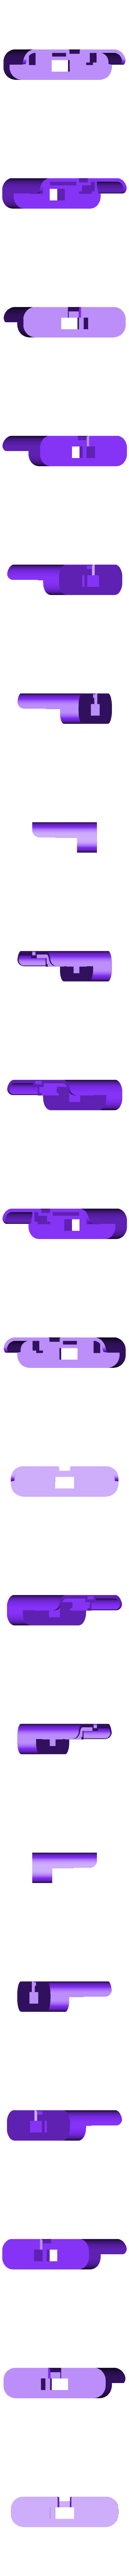 ezi_dab_holder_v1.stl Download free STL file Replacement Dash Holder for EZI DAB Unit • 3D printing template, mikejeffs